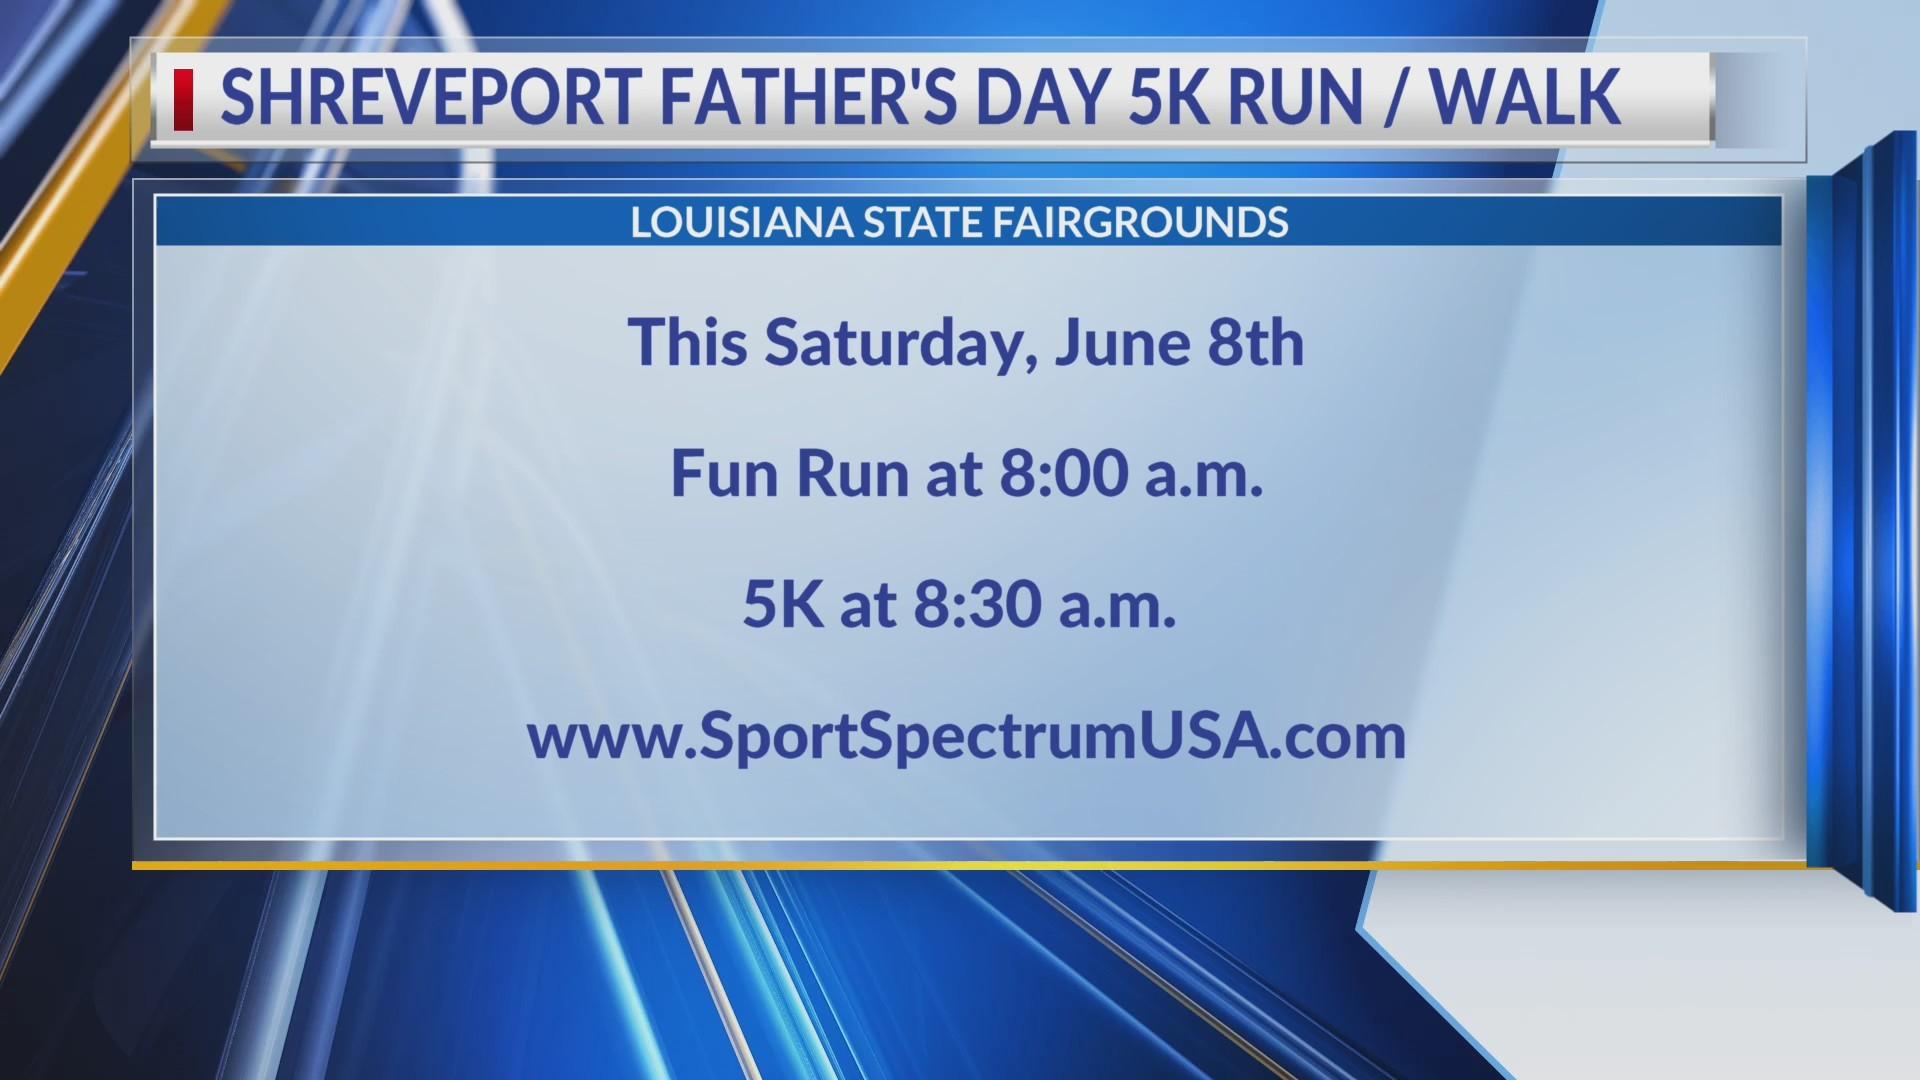 Inaugural Shreveport Father's Day 5K Walk/Run